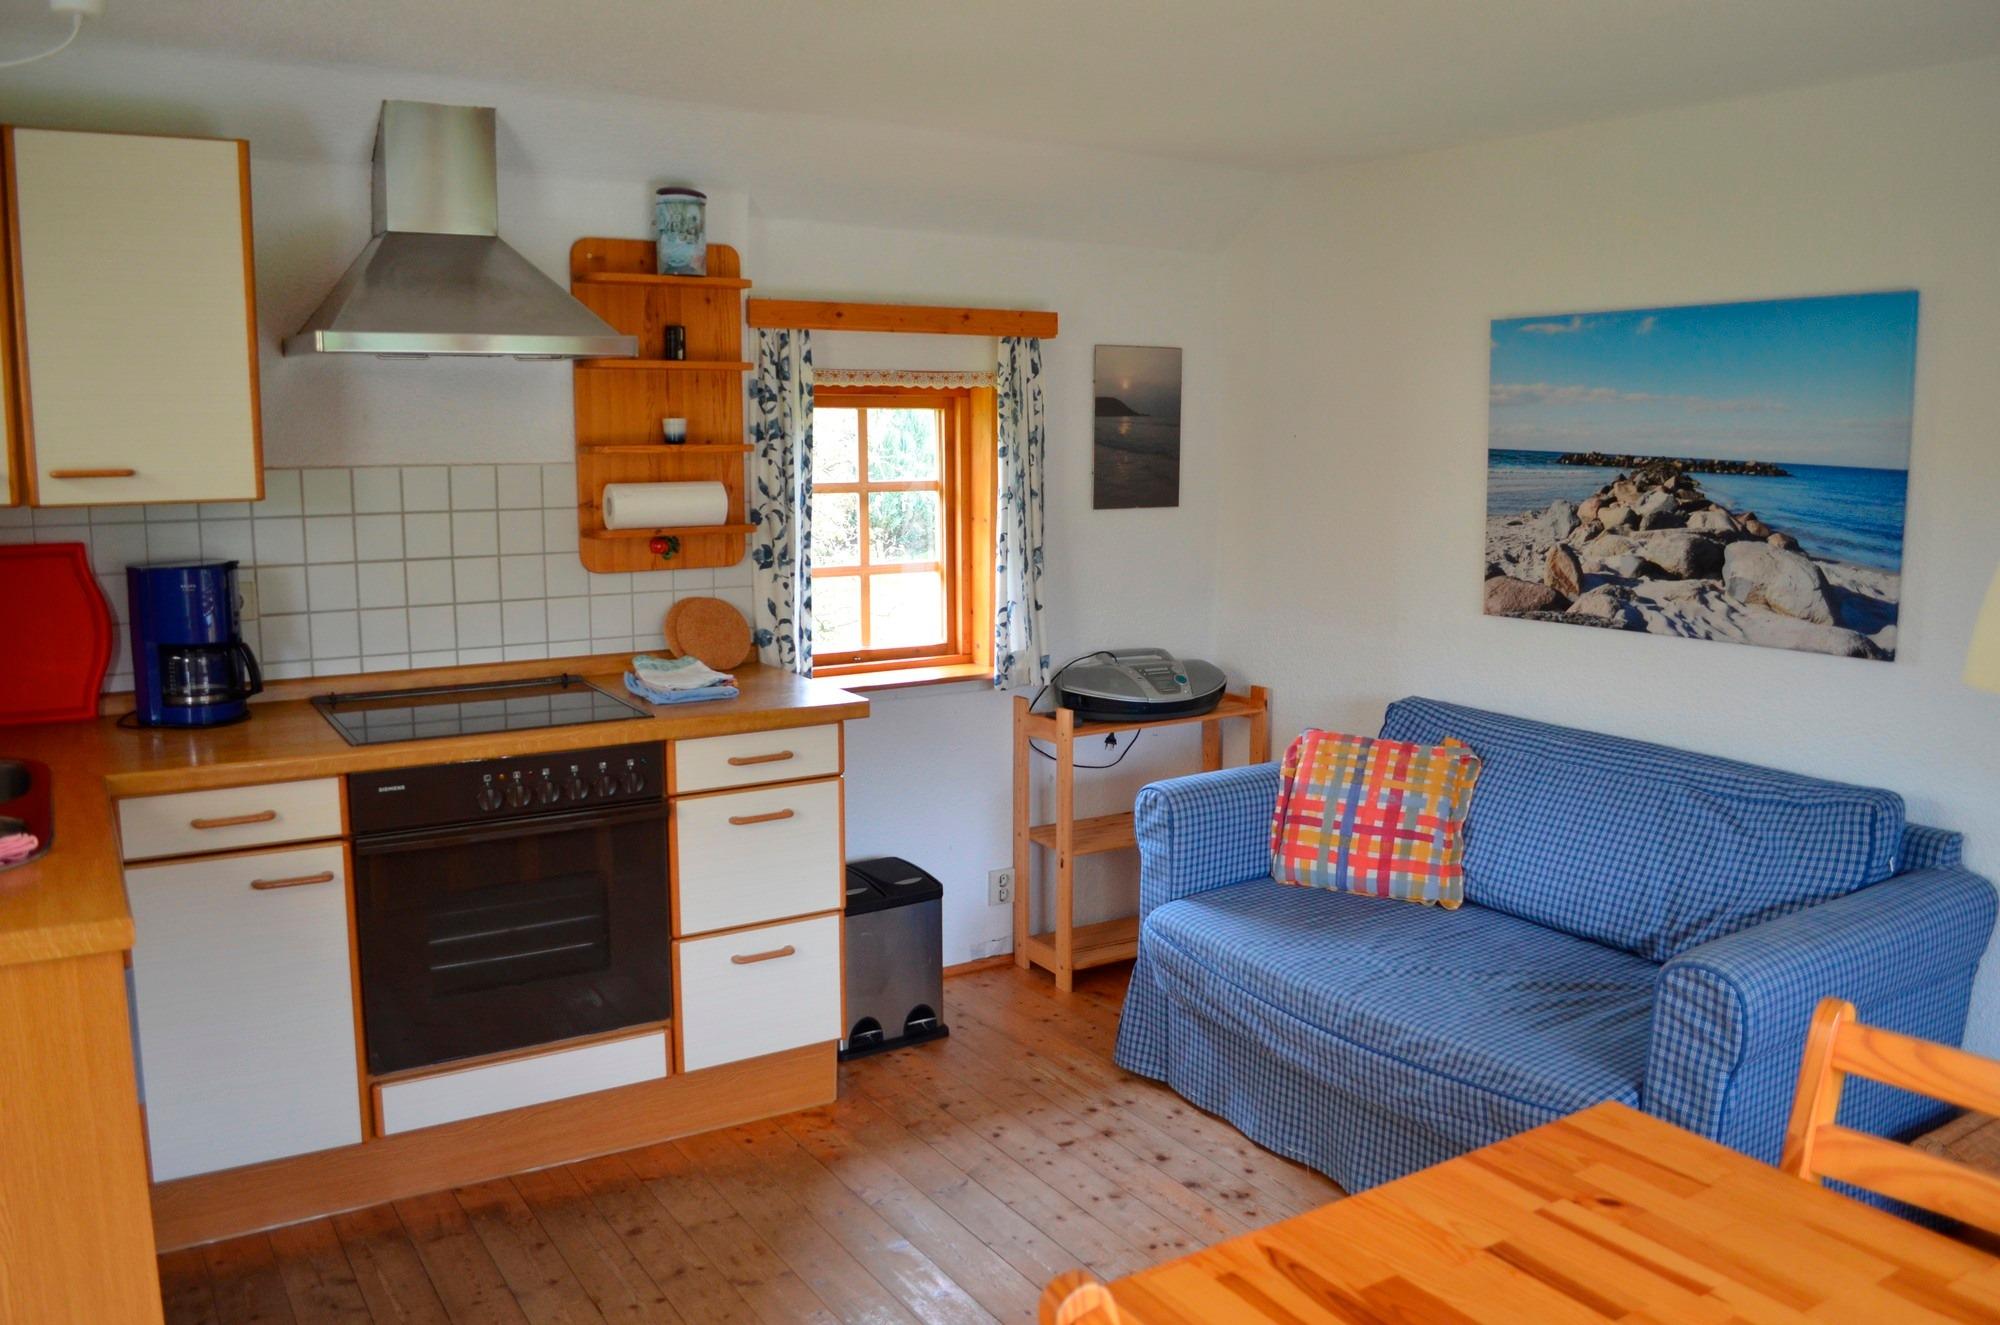 werner nicole ferienhaus das blaue haus kiel fjord. Black Bedroom Furniture Sets. Home Design Ideas